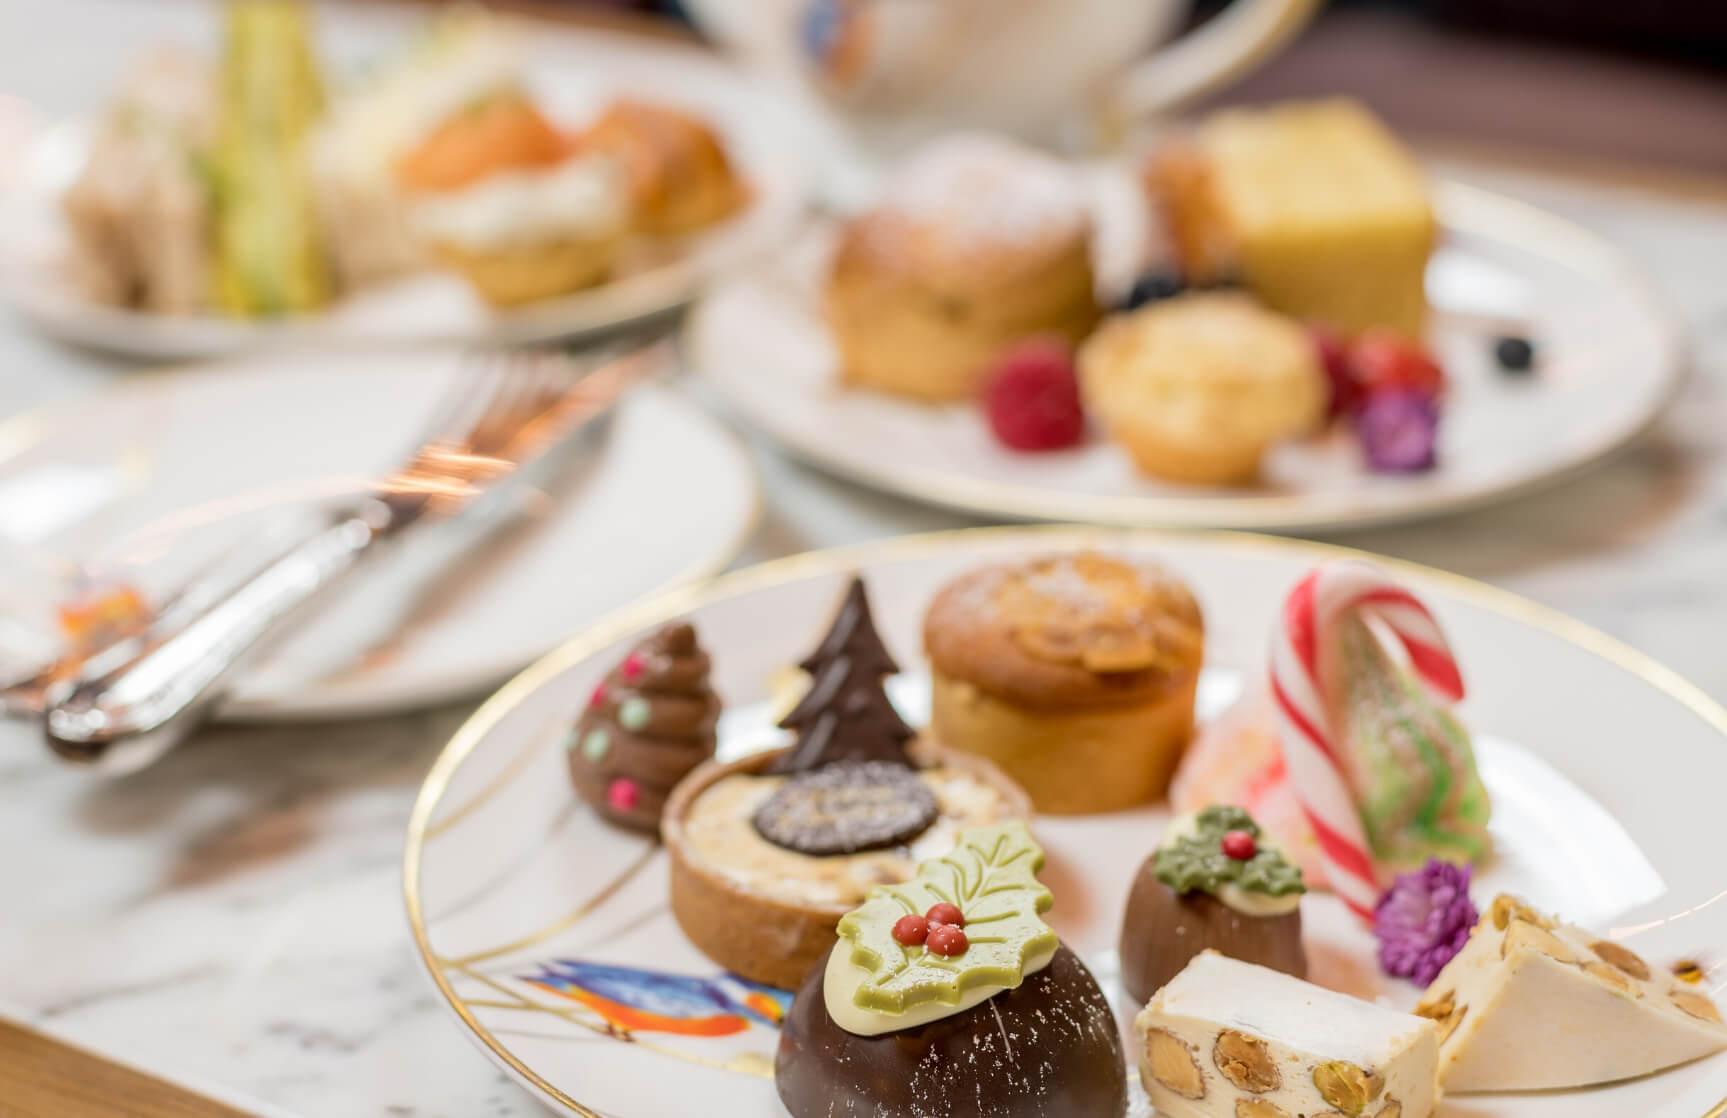 festive afternoon tea desserts at the atrium lounge